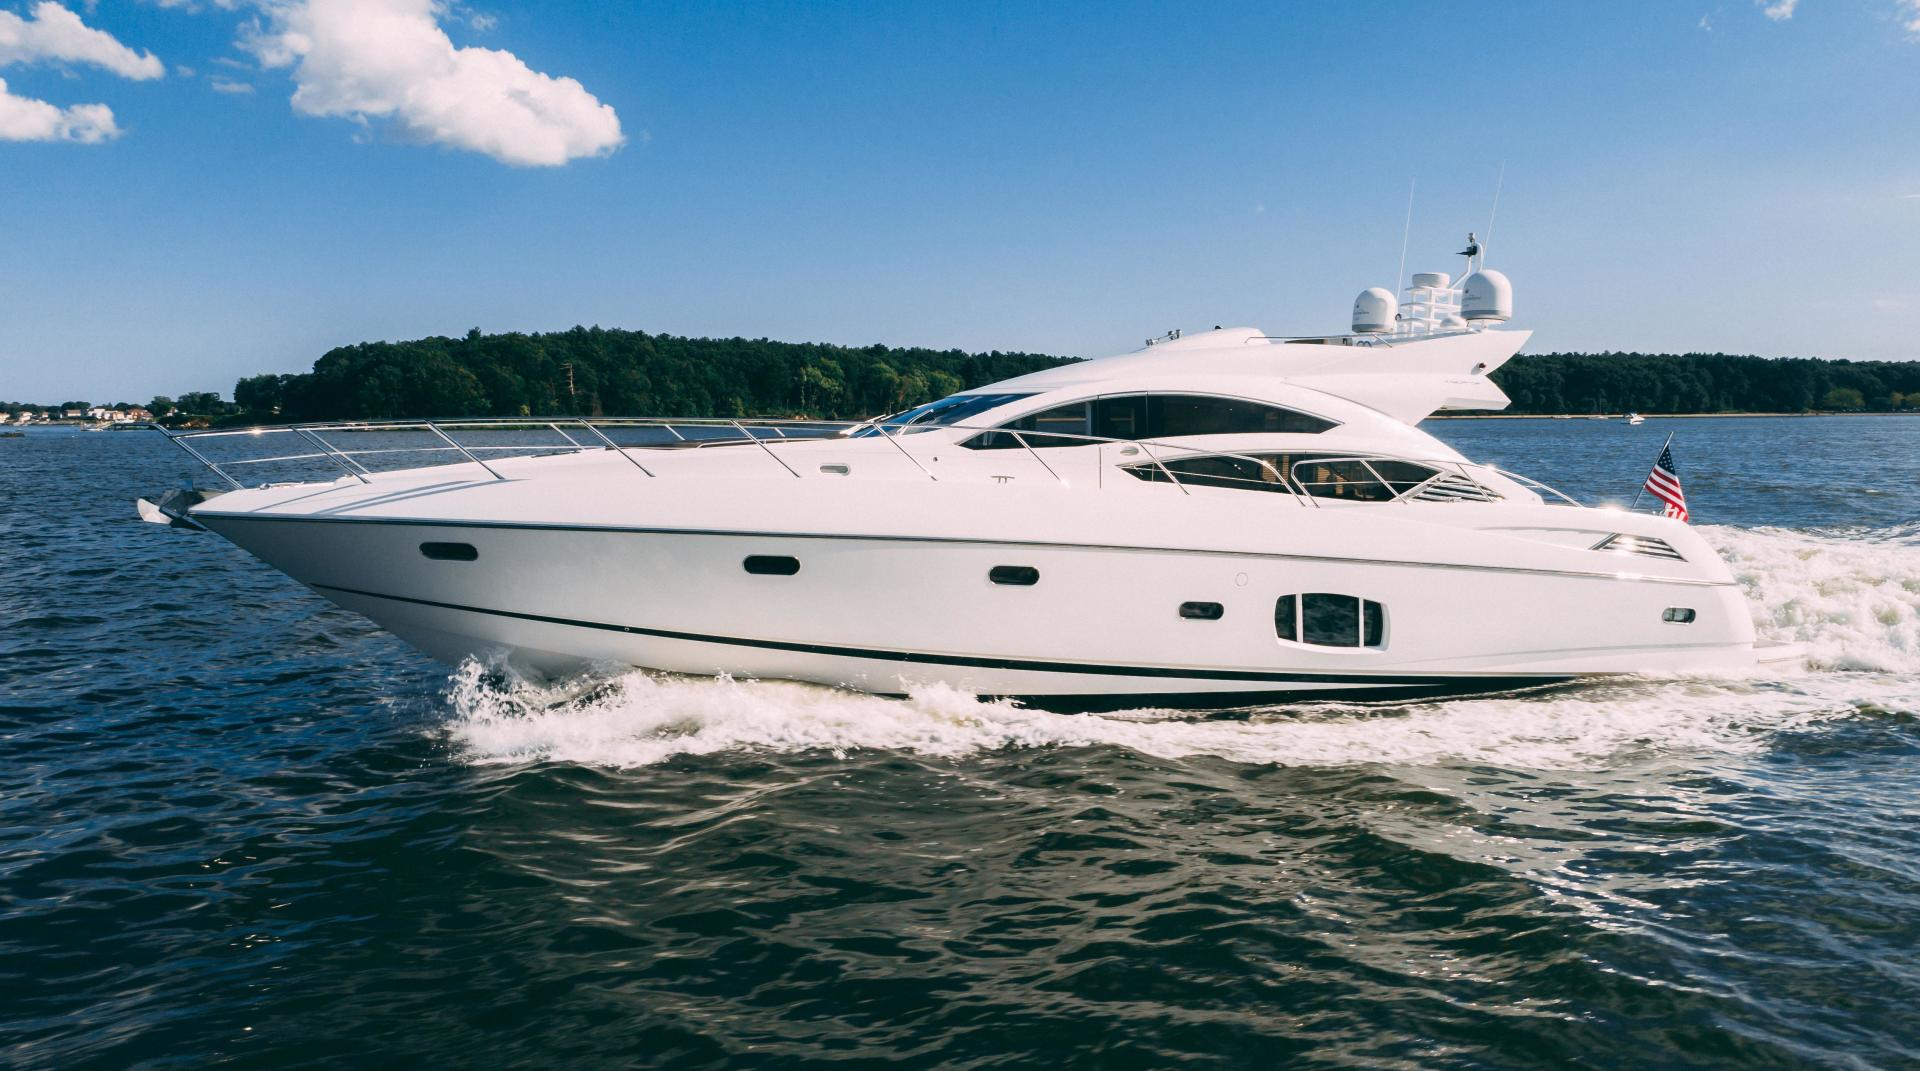 Sunseeker-Motor yacht 2012-JIMBO New Port-Rhode Island-United States-1480121 | Thumbnail